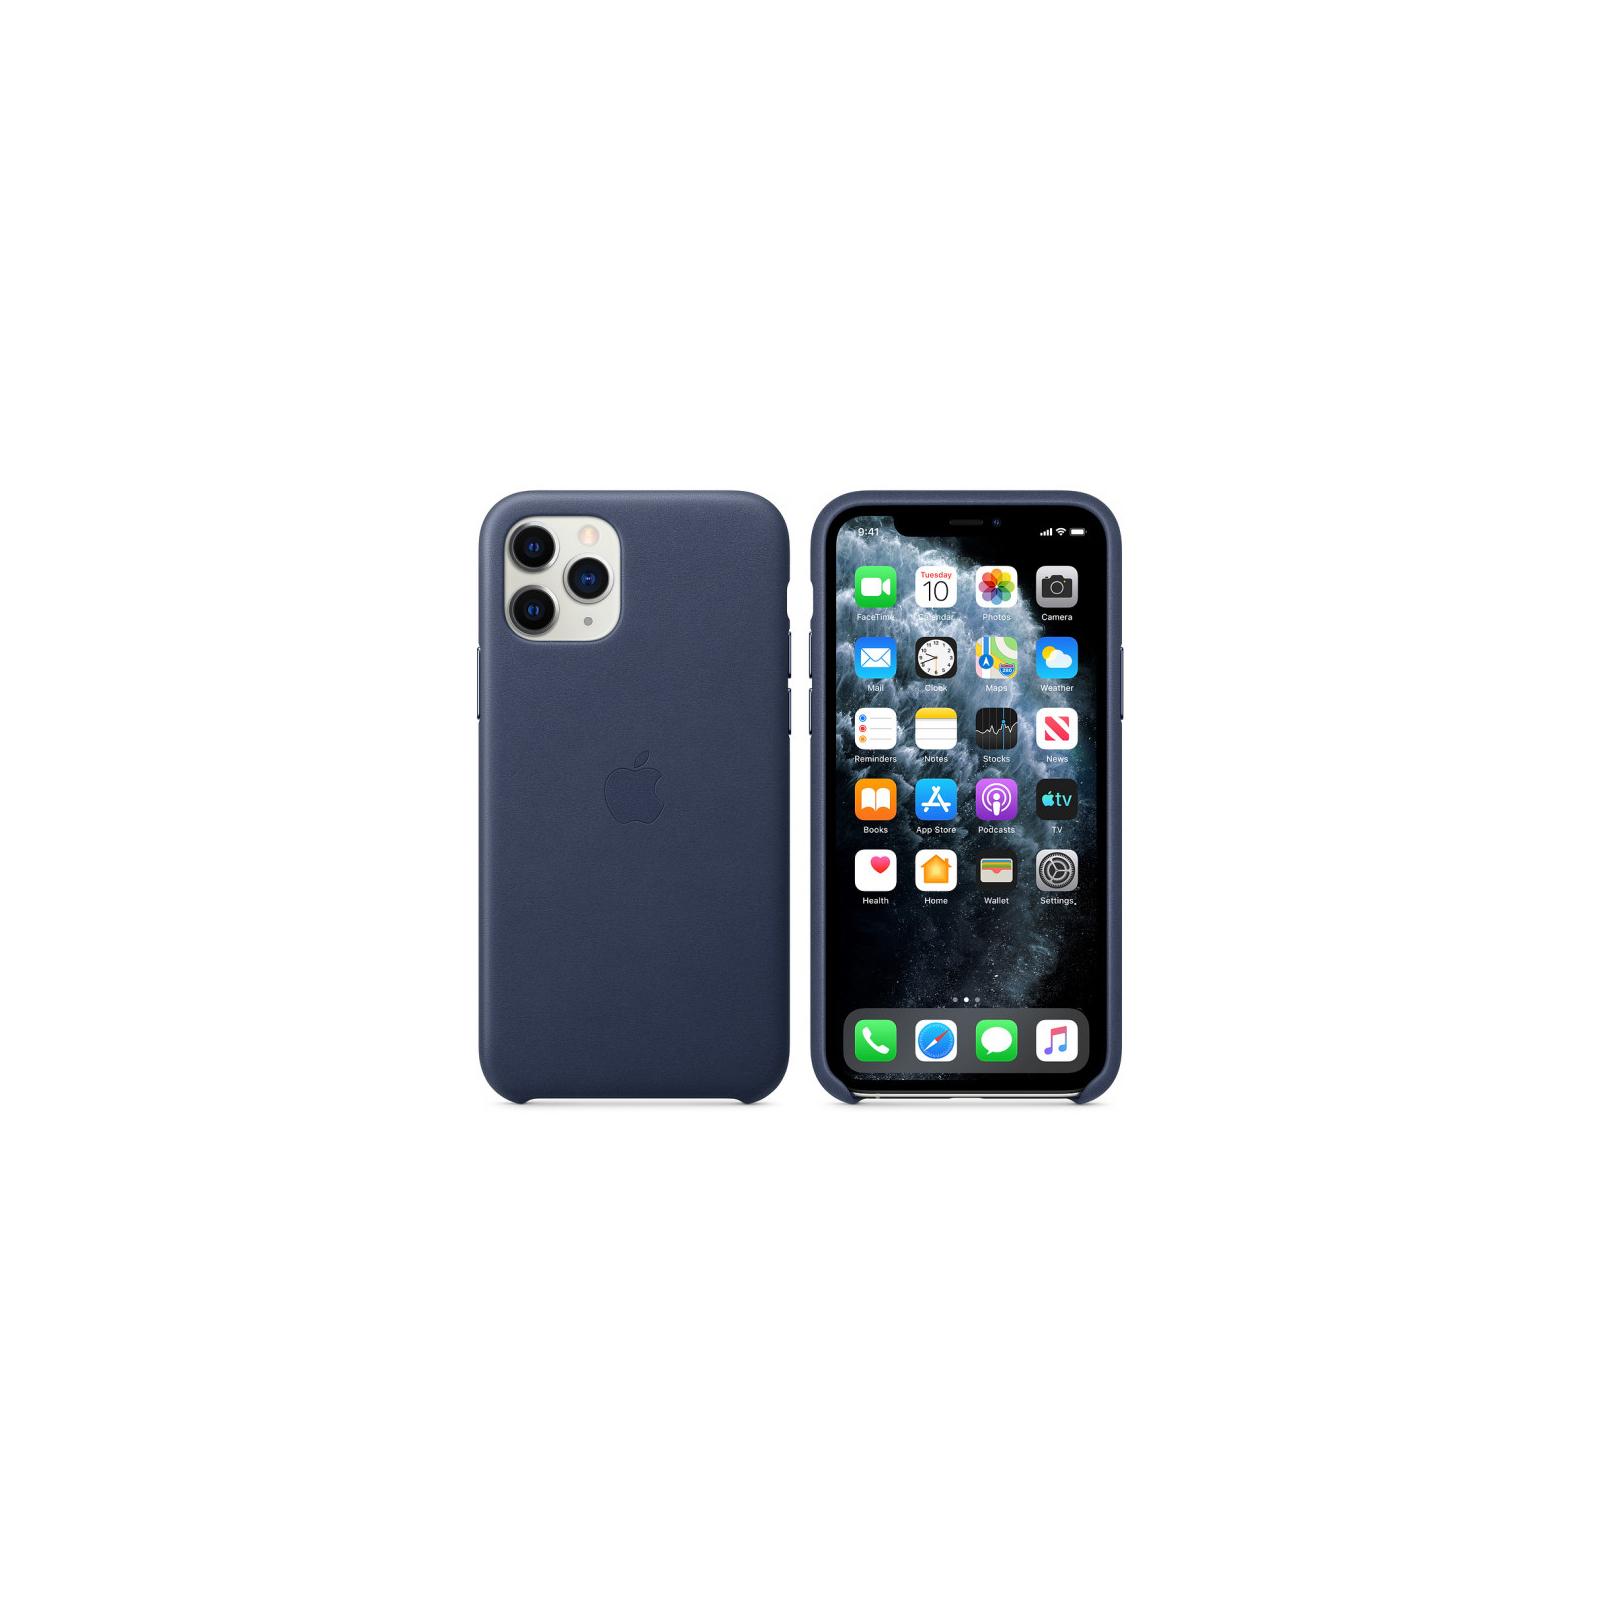 Чехол для моб. телефона Apple iPhone 11 Pro Leather Case - Midnight Blue (MWYG2ZM/A) изображение 6